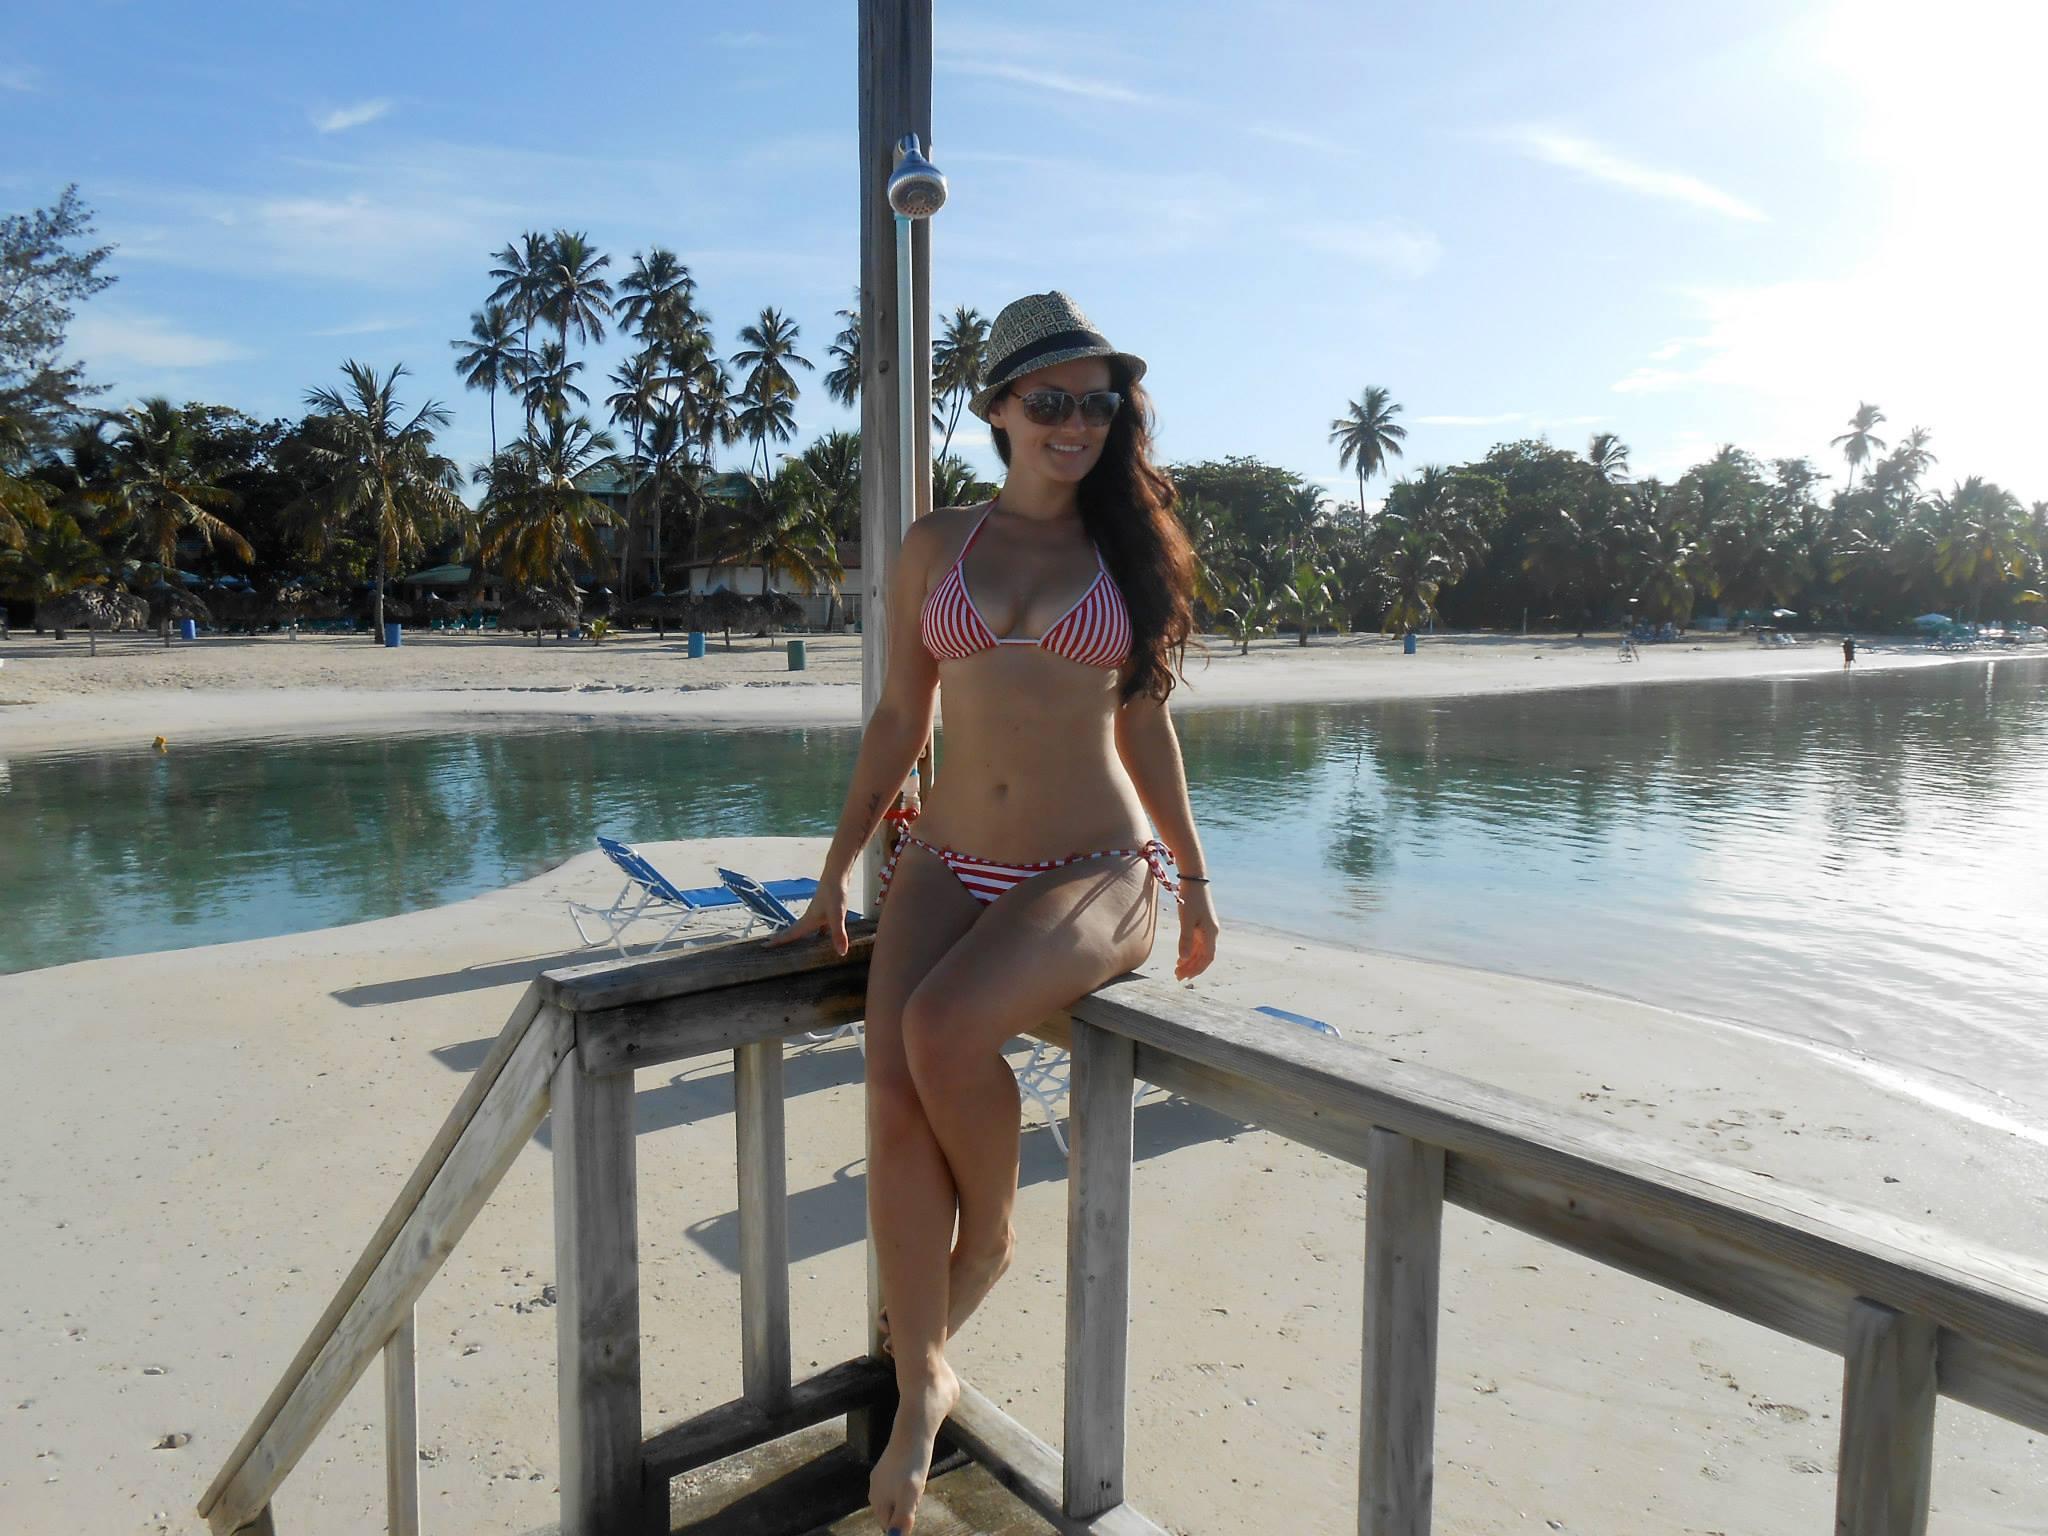 Feet Jennifer Wenger nudes (26 photos), Topless, Bikini, Instagram, underwear 2017